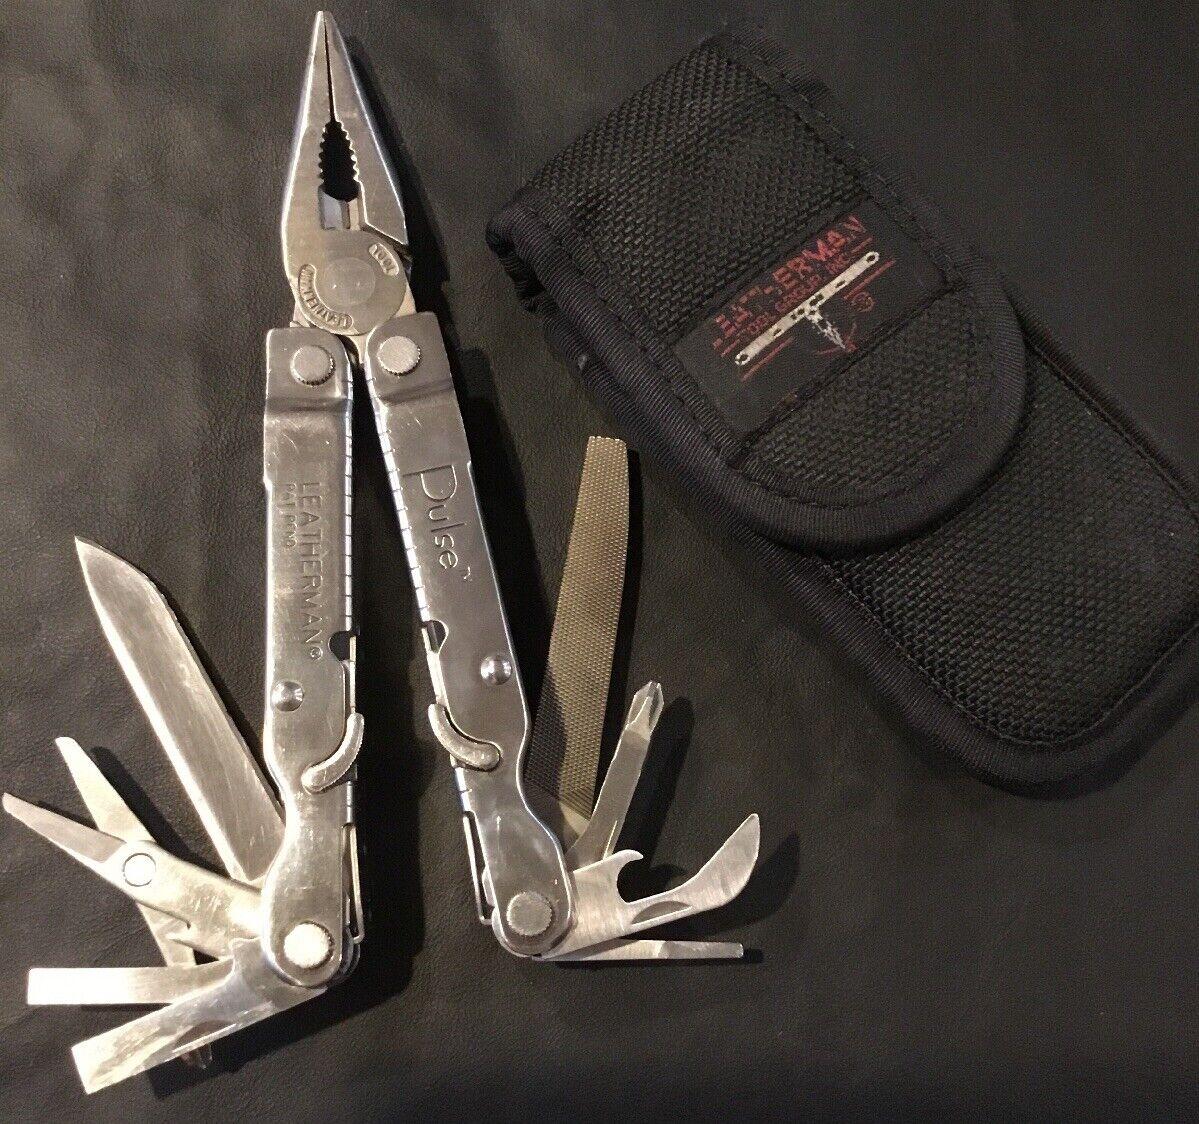 Retirerade Leatherman Pulse Multi Tool, W  Sheath, Engraved {65533;65533;, NTG 65533;,,,\95533;95533;;; 0603) (1003)